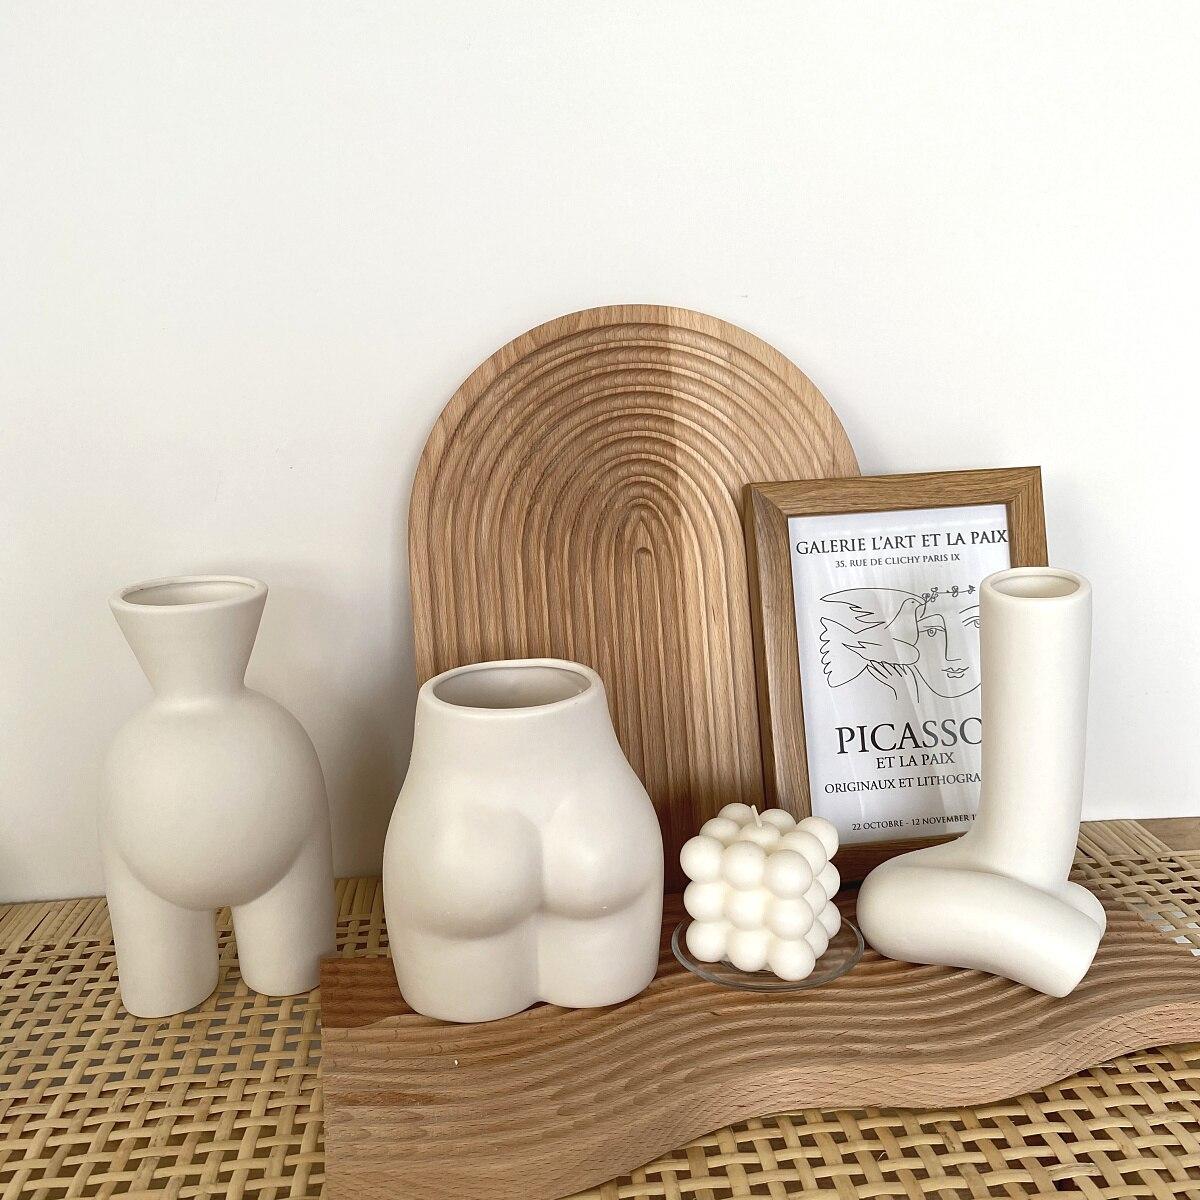 Creativity Ceramics Vase Human Body Nude Abstract Flower Vase Flower Arrangement Crafts Handmade Modern Home Decoration